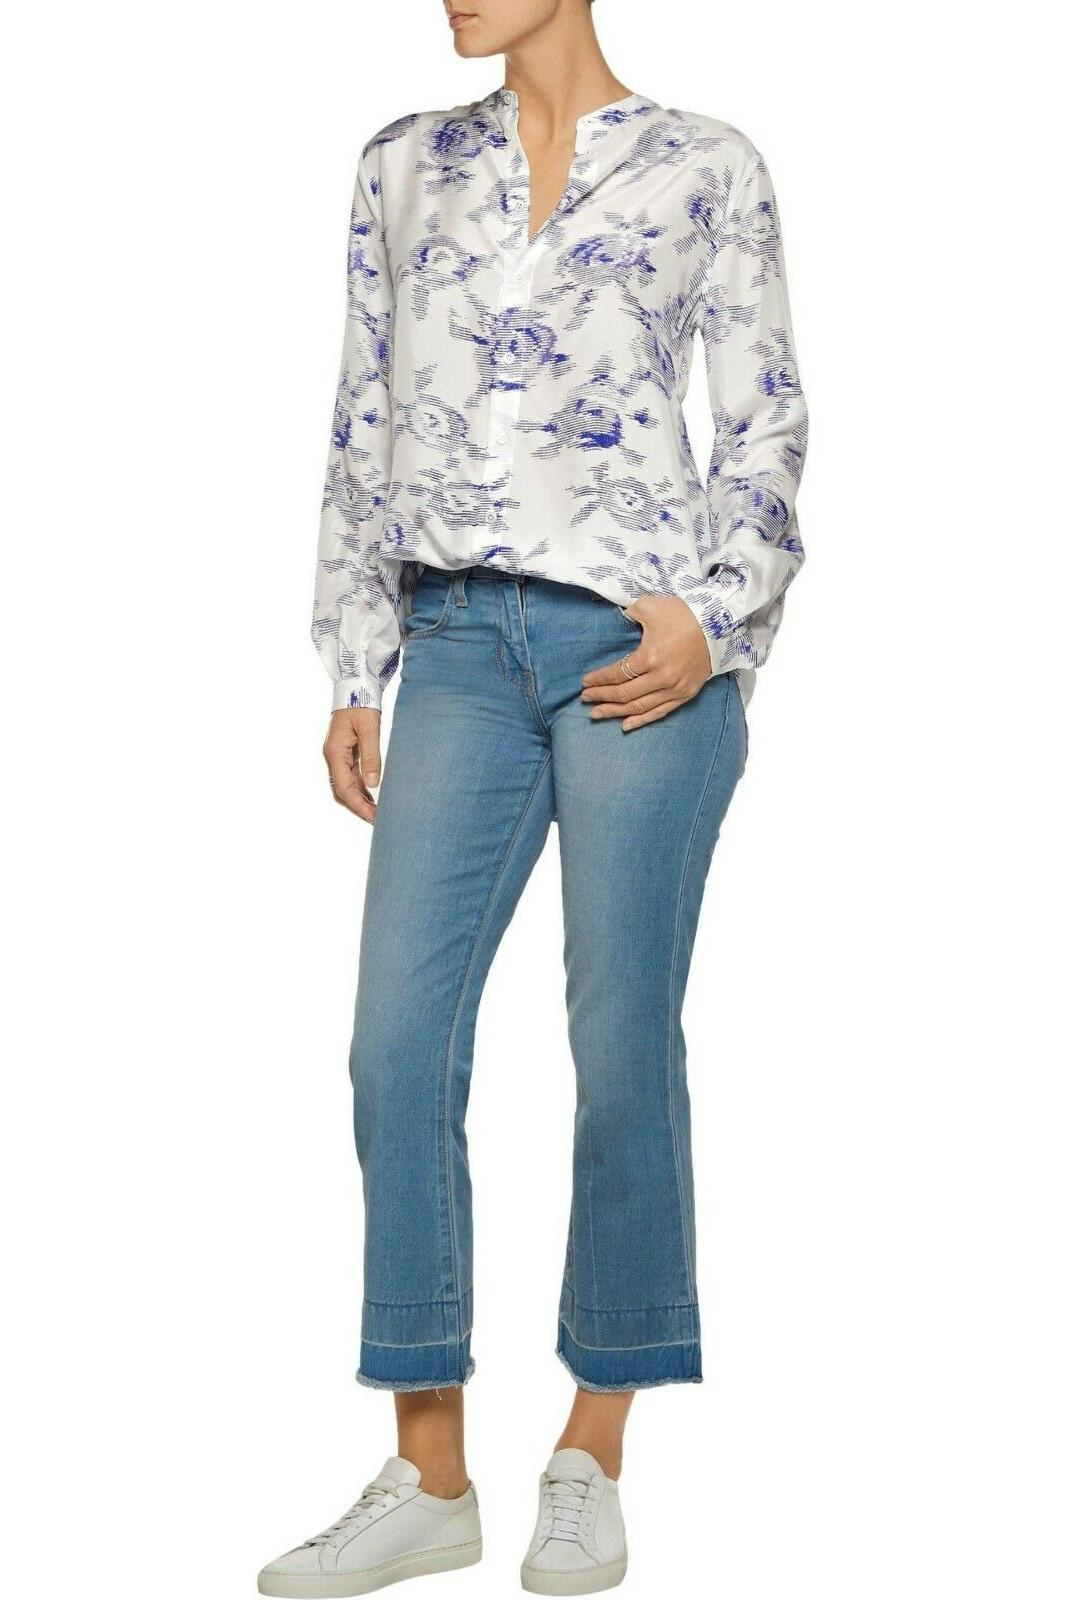 219 nwt henri silk blouse white